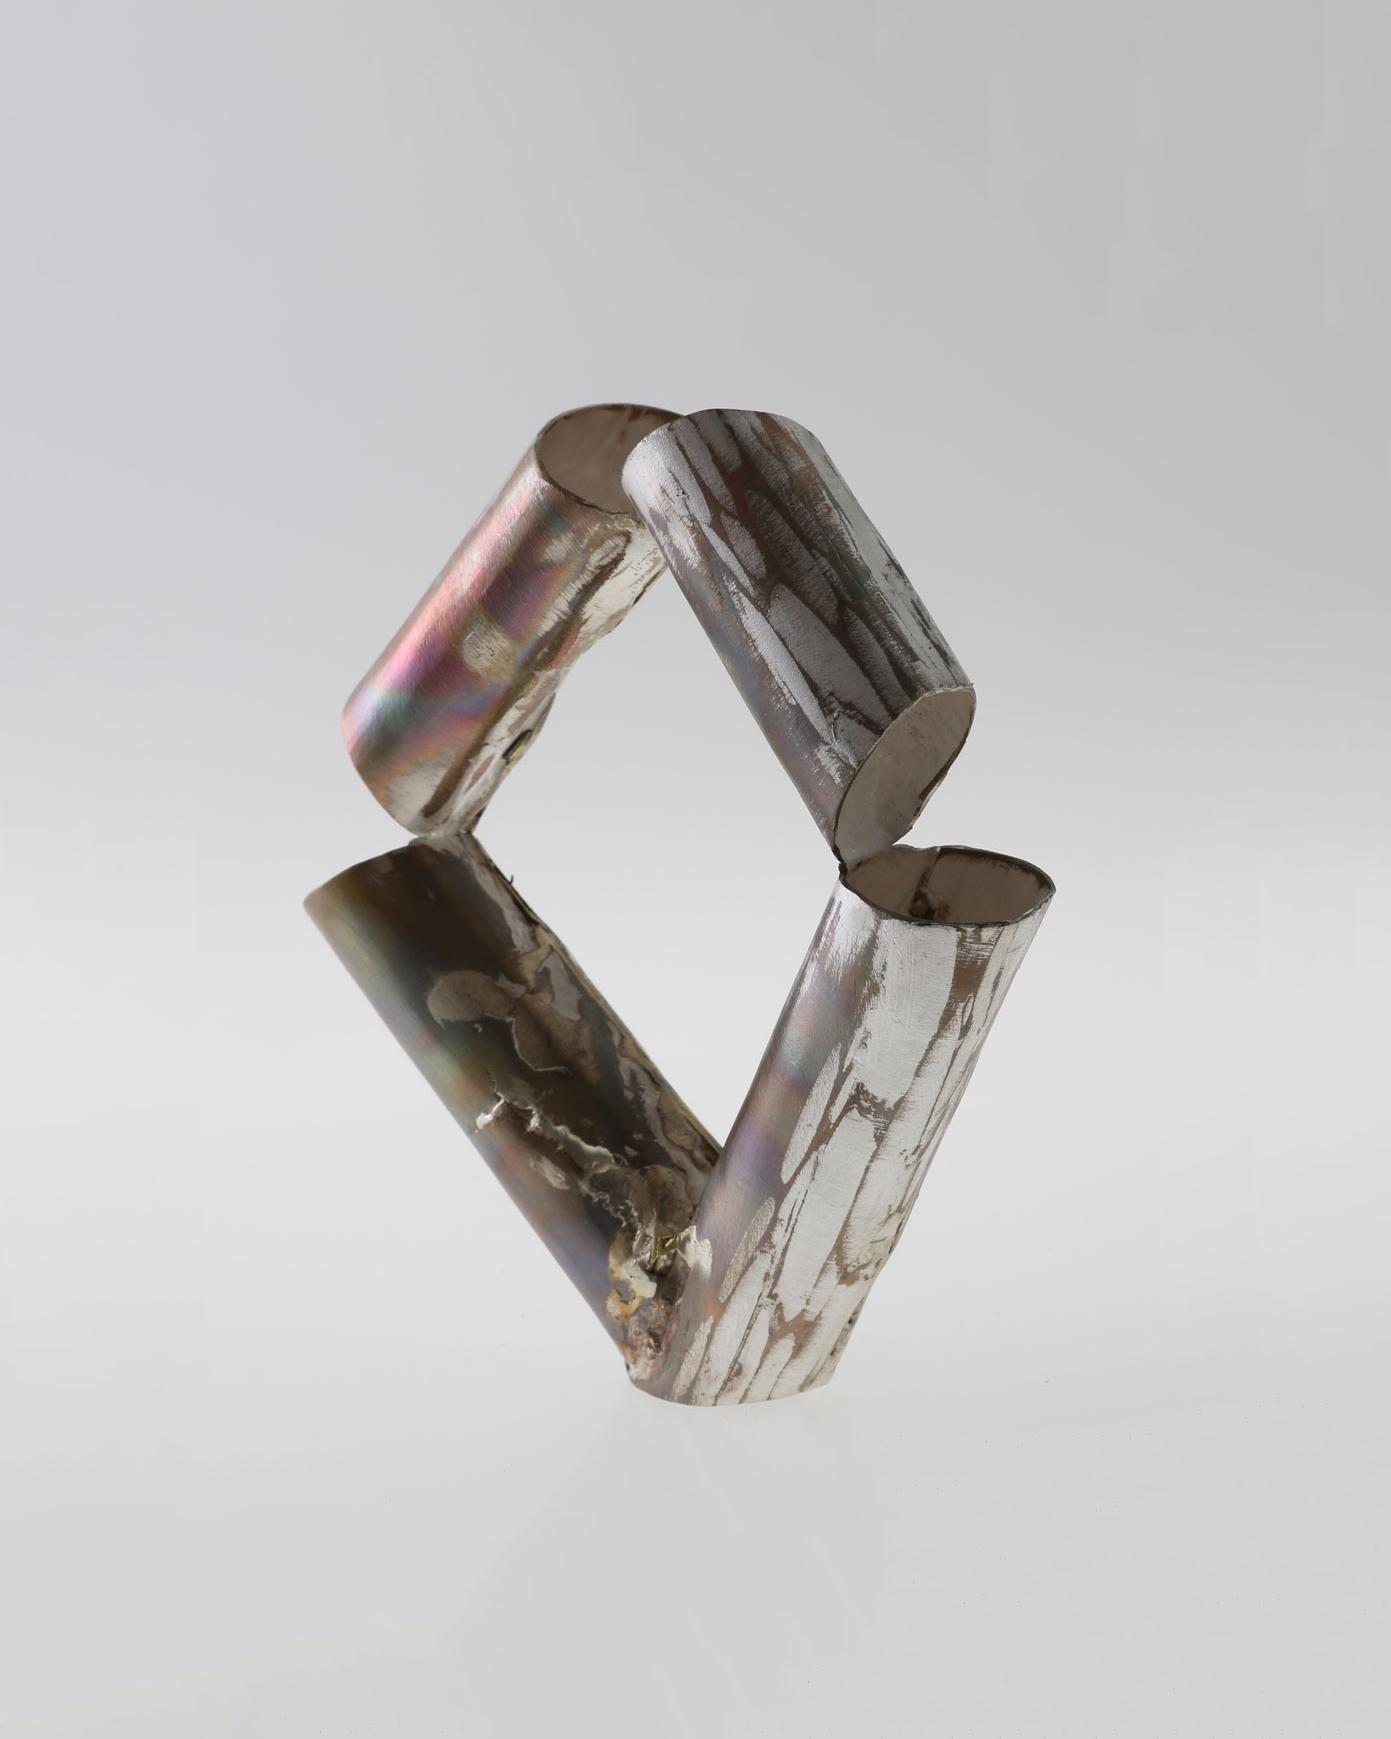 Rudolf Kocéa, Stücke 1 (Stukken 1), 2018, armband; zilver, koper, ø 60 mm, €2125